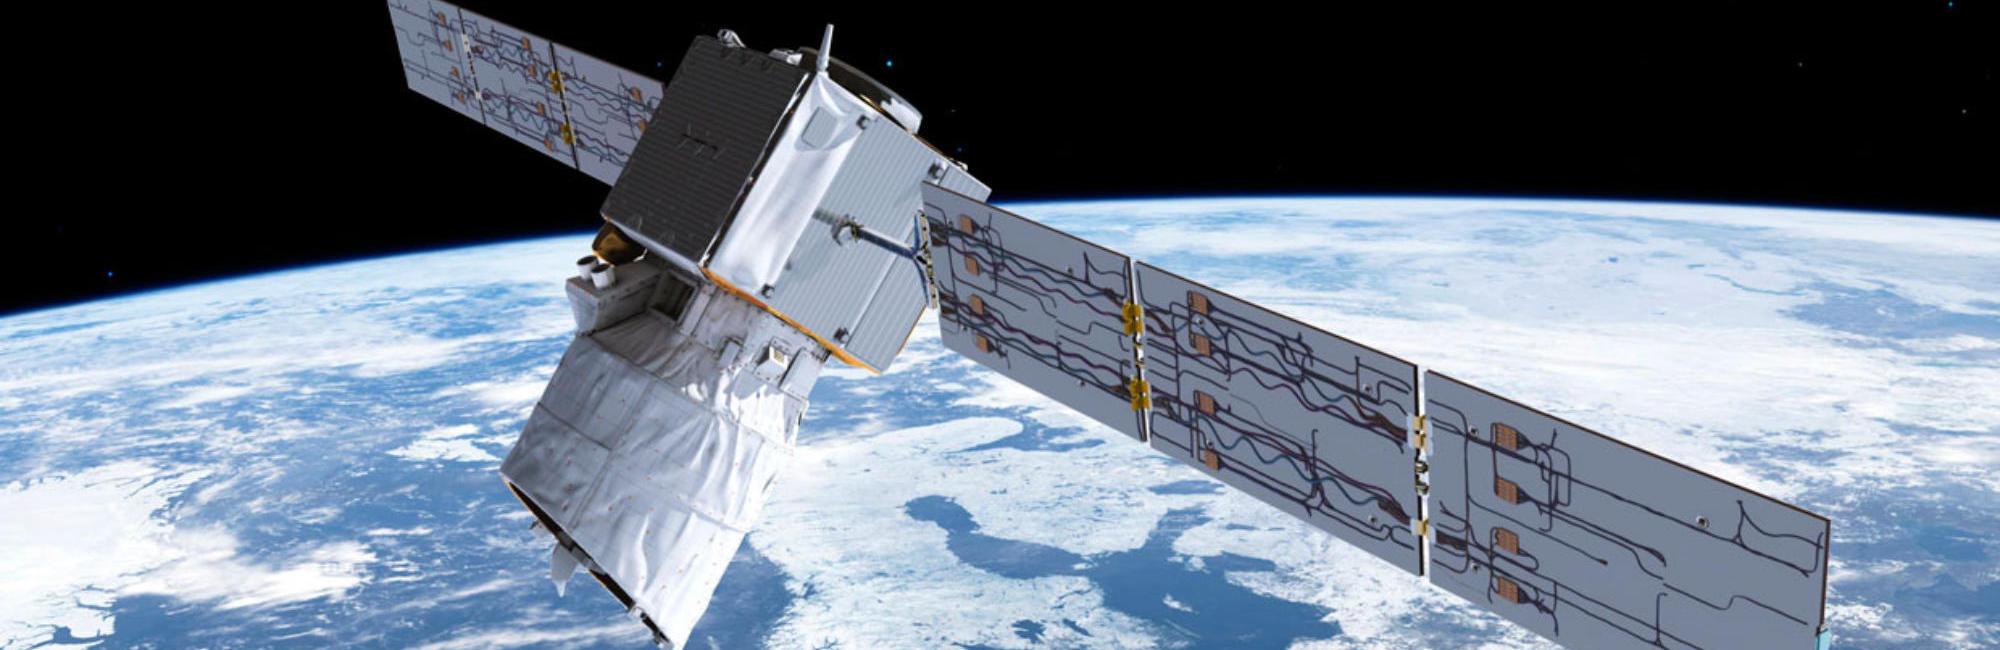 slide-1-satellite2